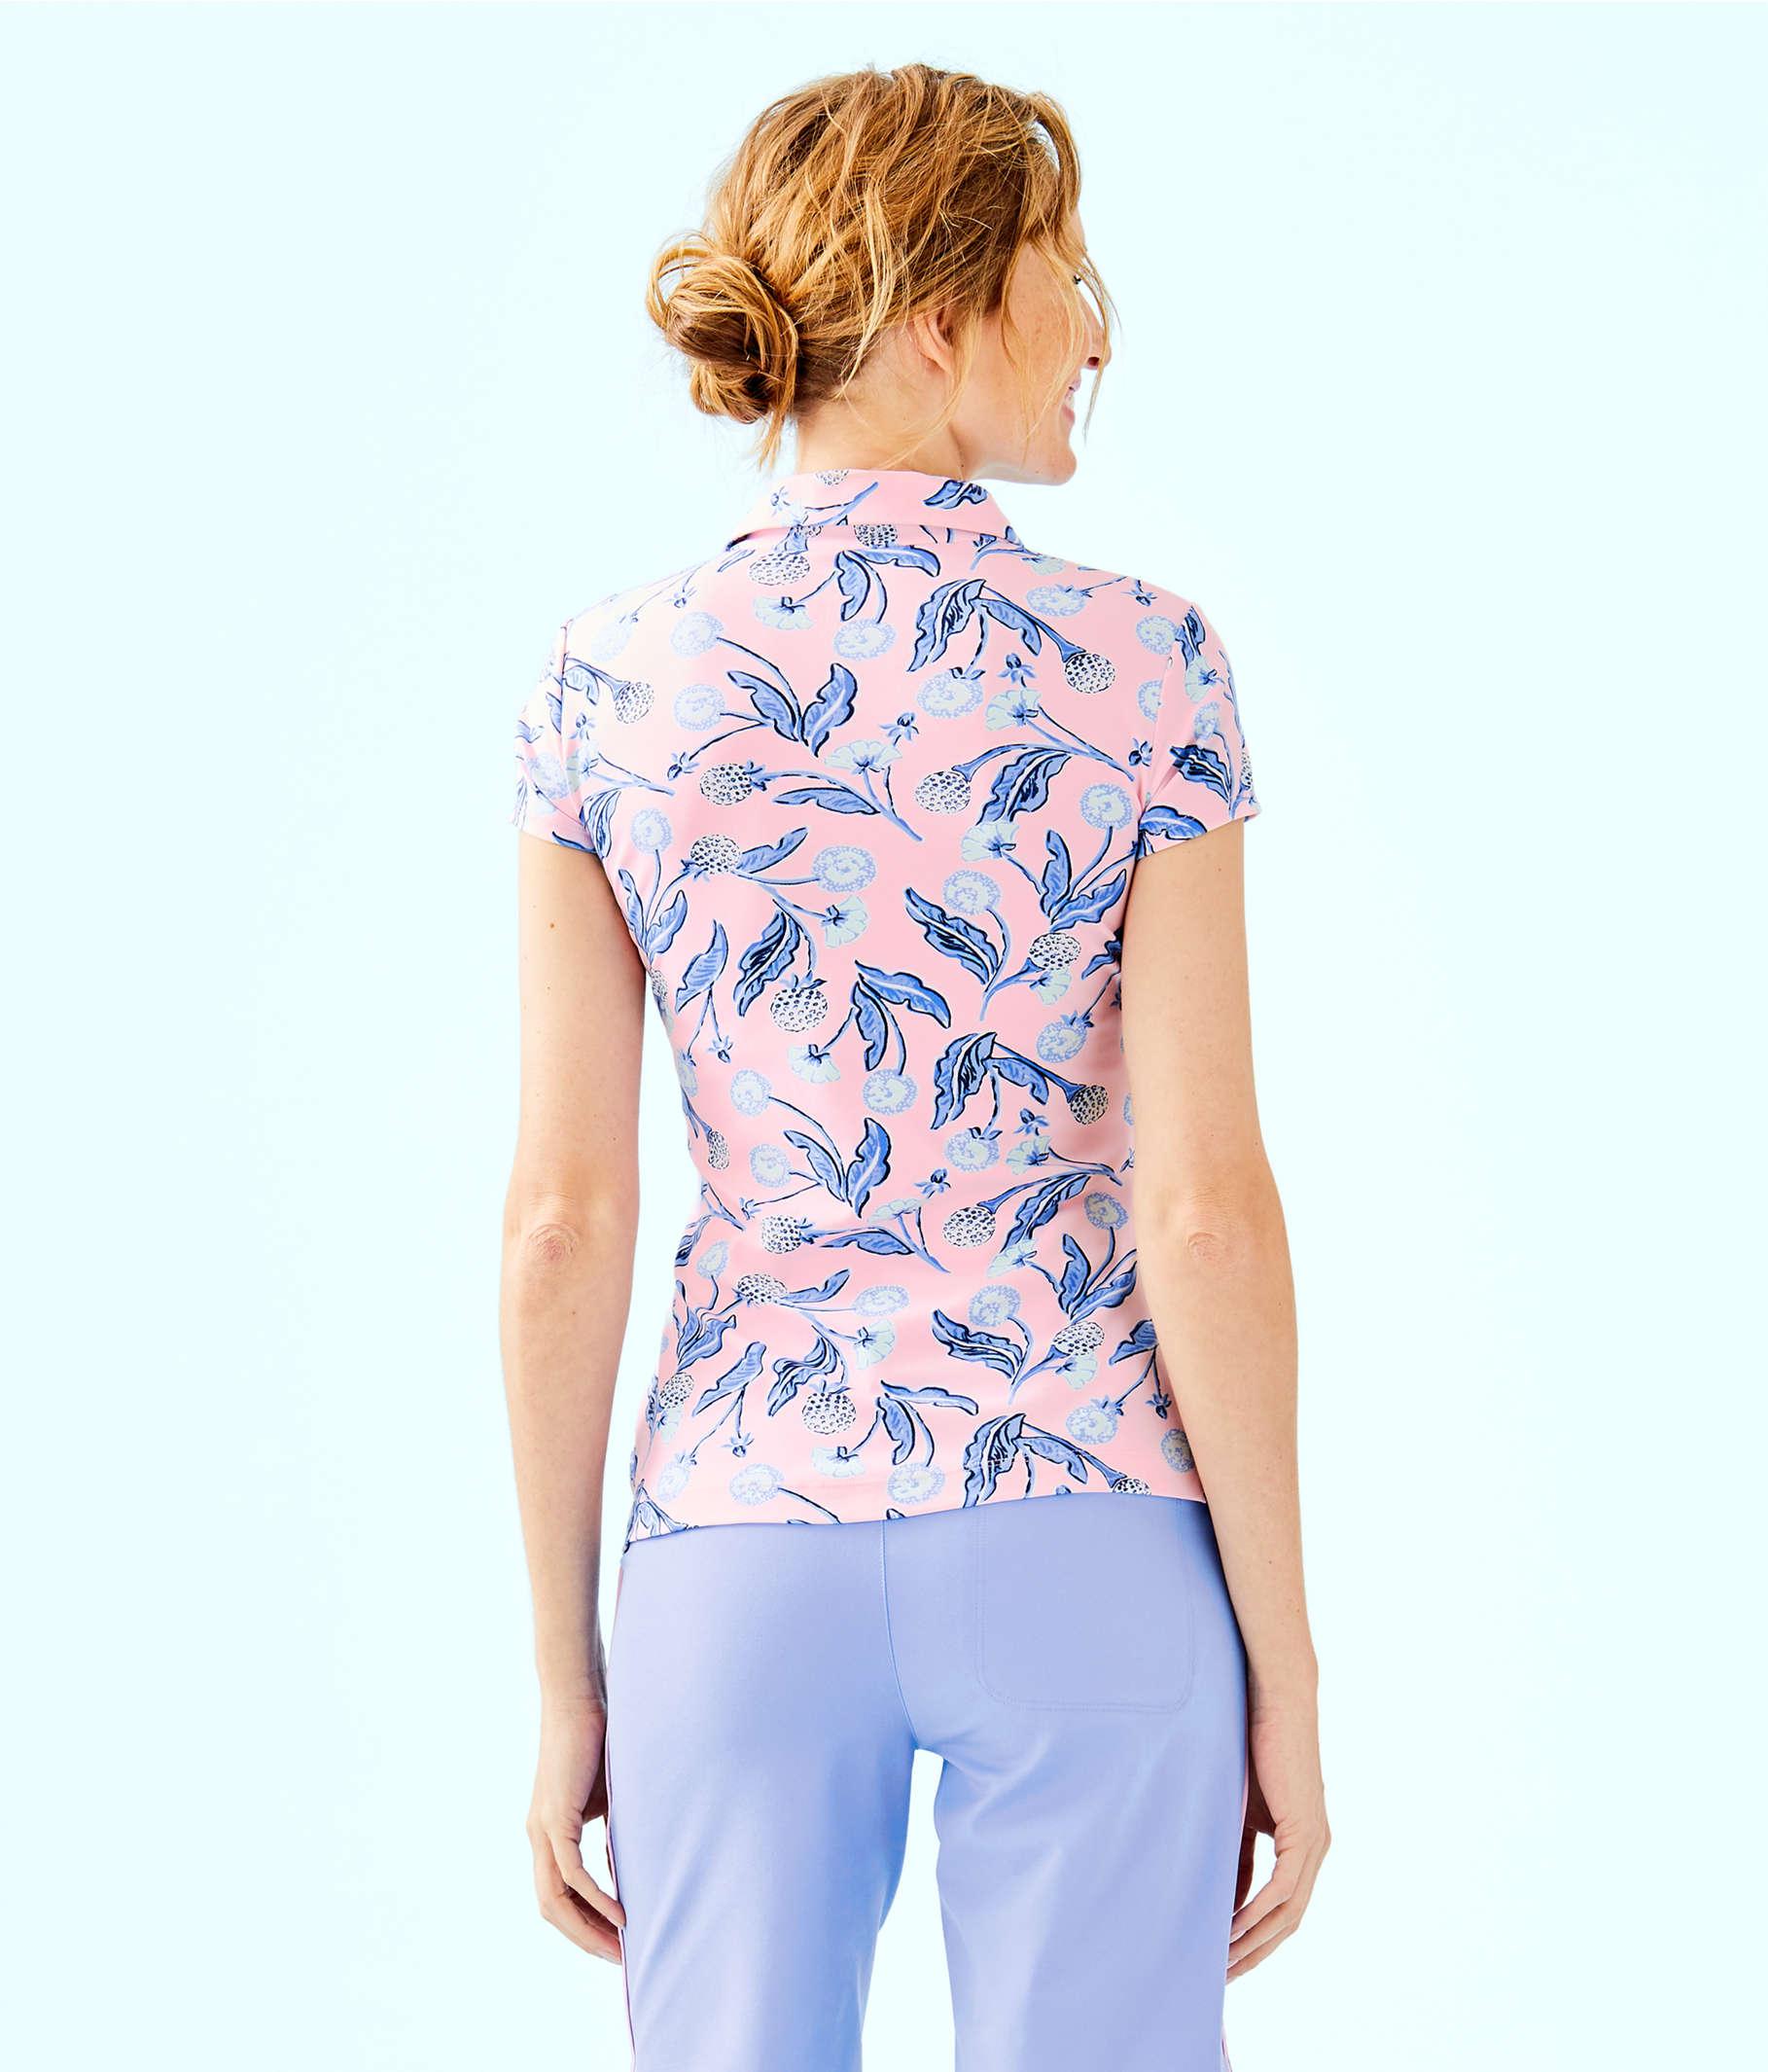 0d4eda31a1ceaf ... UPF 50+ Luxletic Frida Polo Top, Pink Tropics Tint Par Tee Time, large  ...